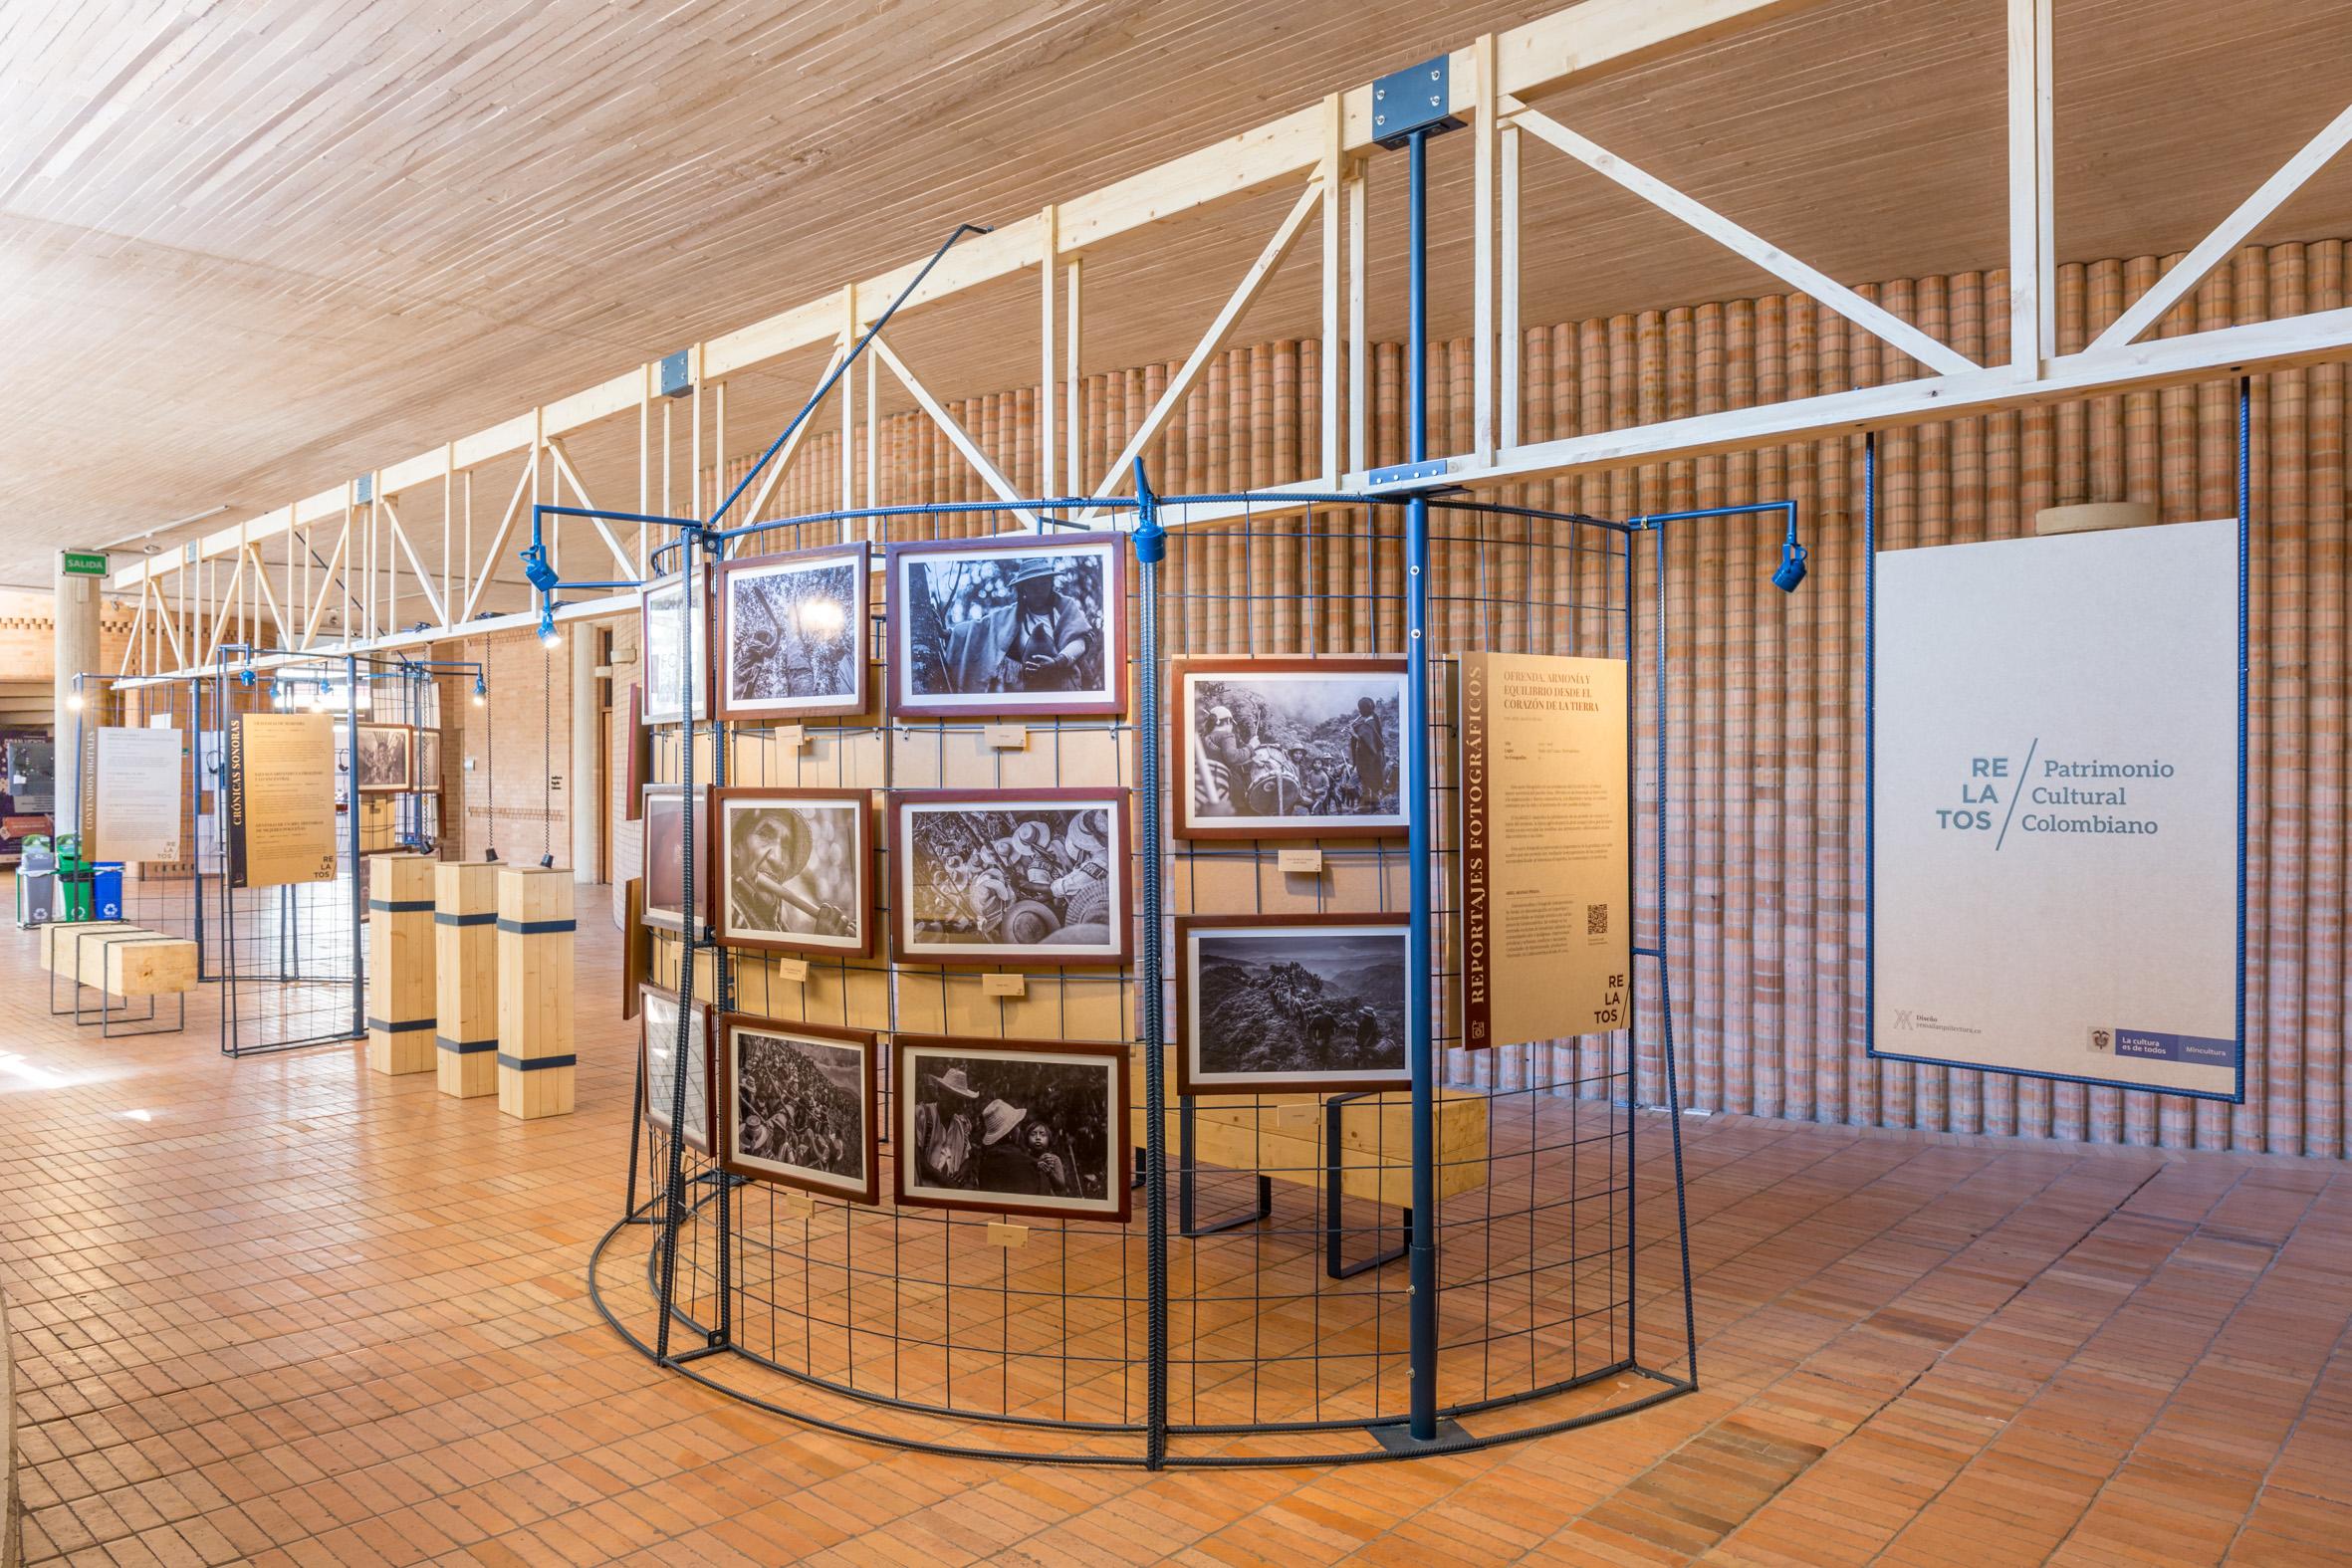 Exposición Relatos Patrimonio Cultural Centro Cultural Gabriel Garcia Marquez 2018